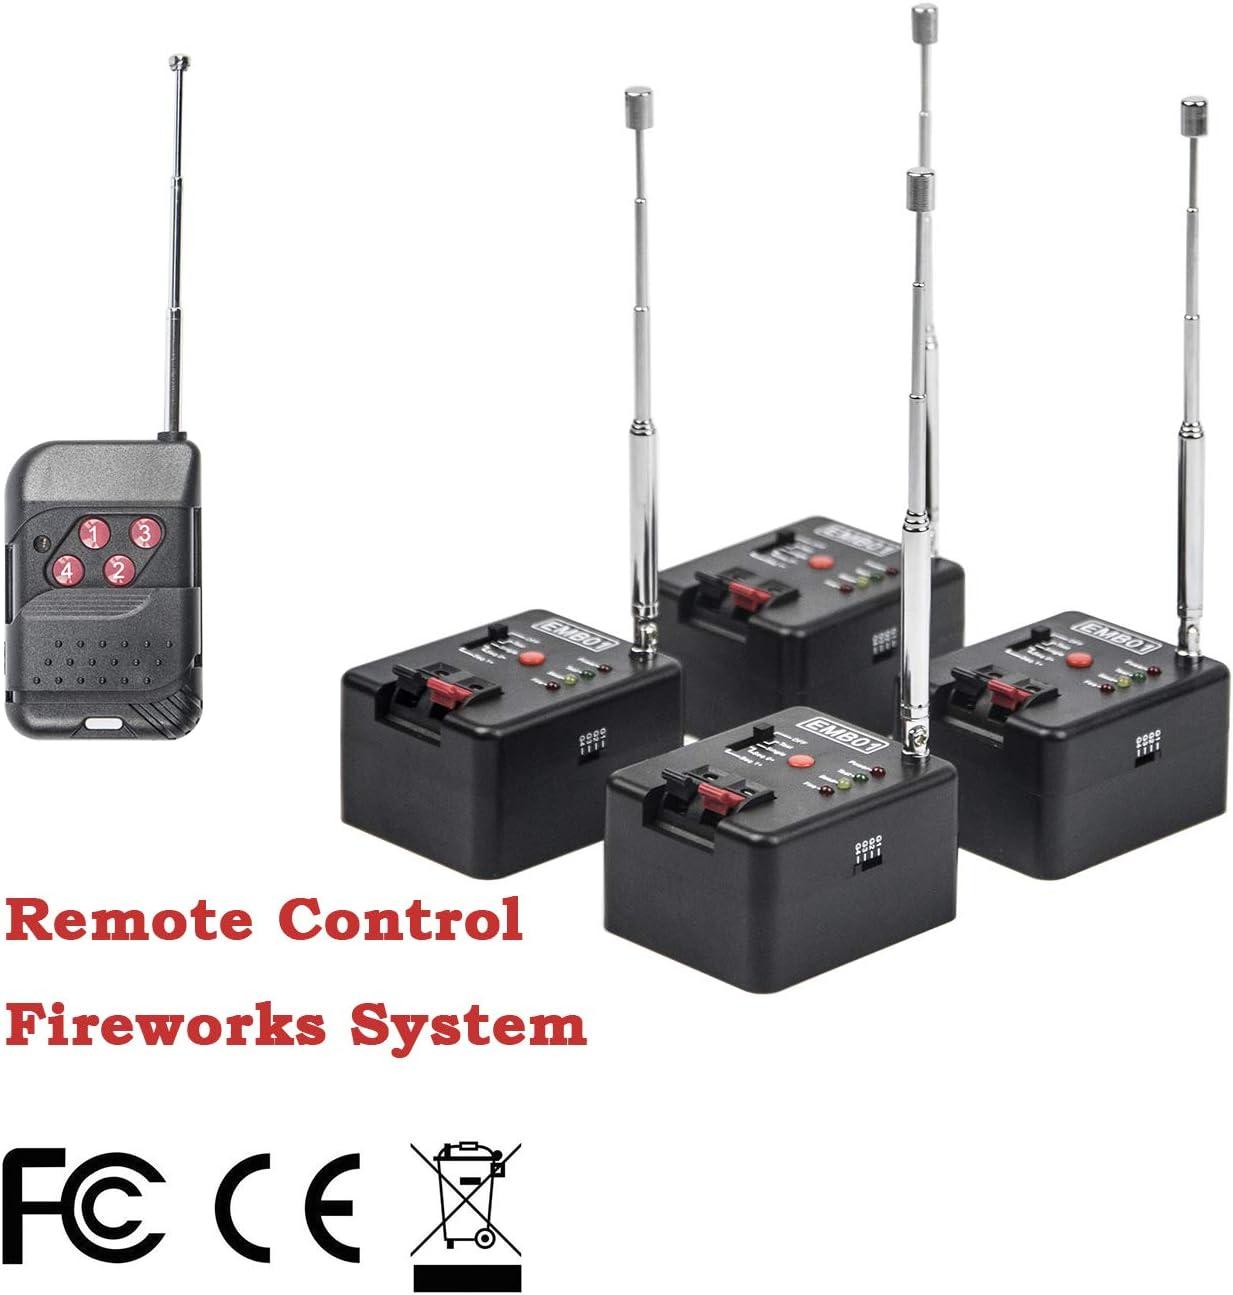 4 Cue Remote Wireless Control Fire-Work Firing Systemand Wedding Equipment EMB01-04R